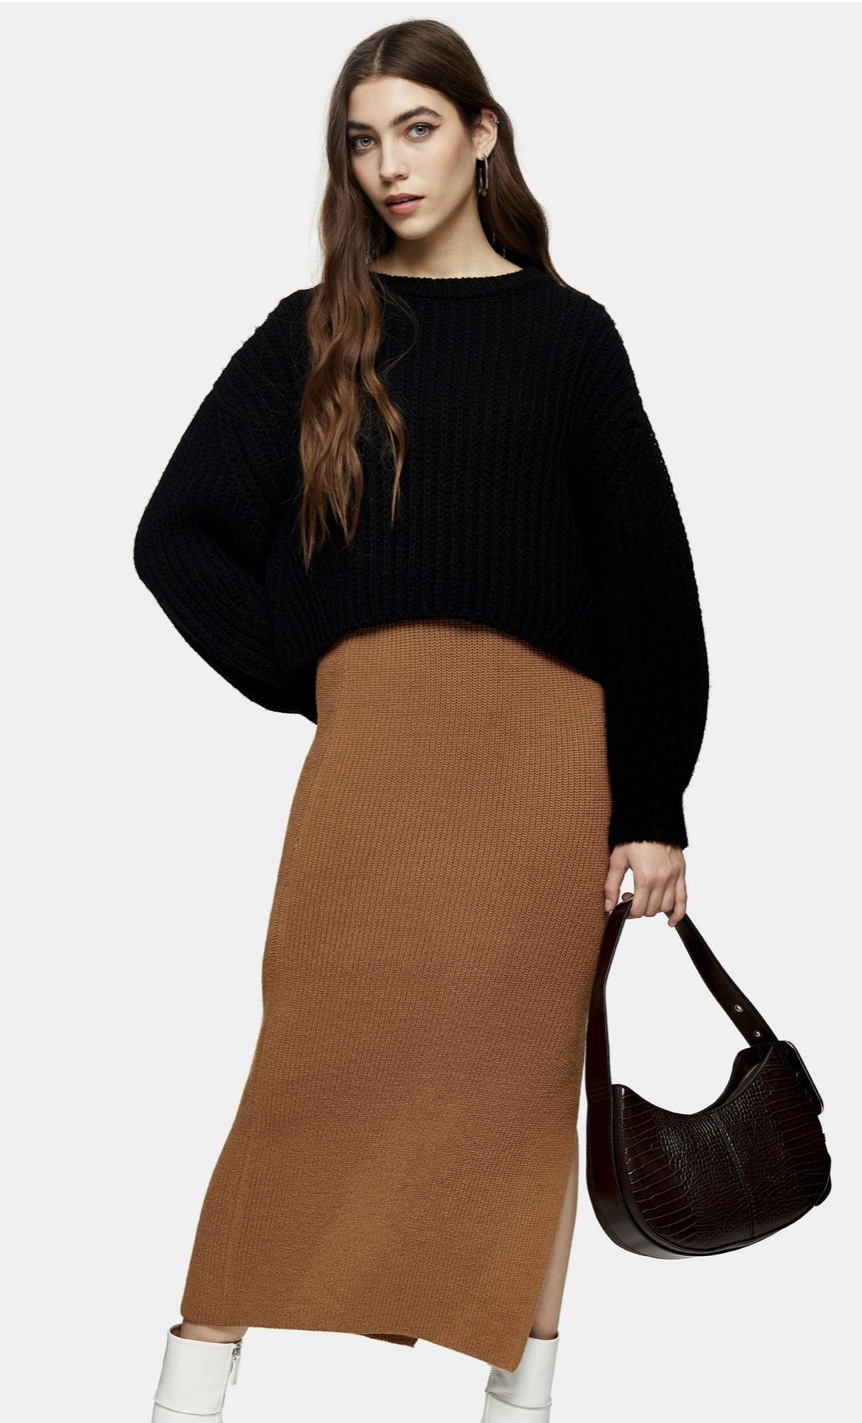 girl standing. girl in skirt. dopefashionsense. dope fashion sense